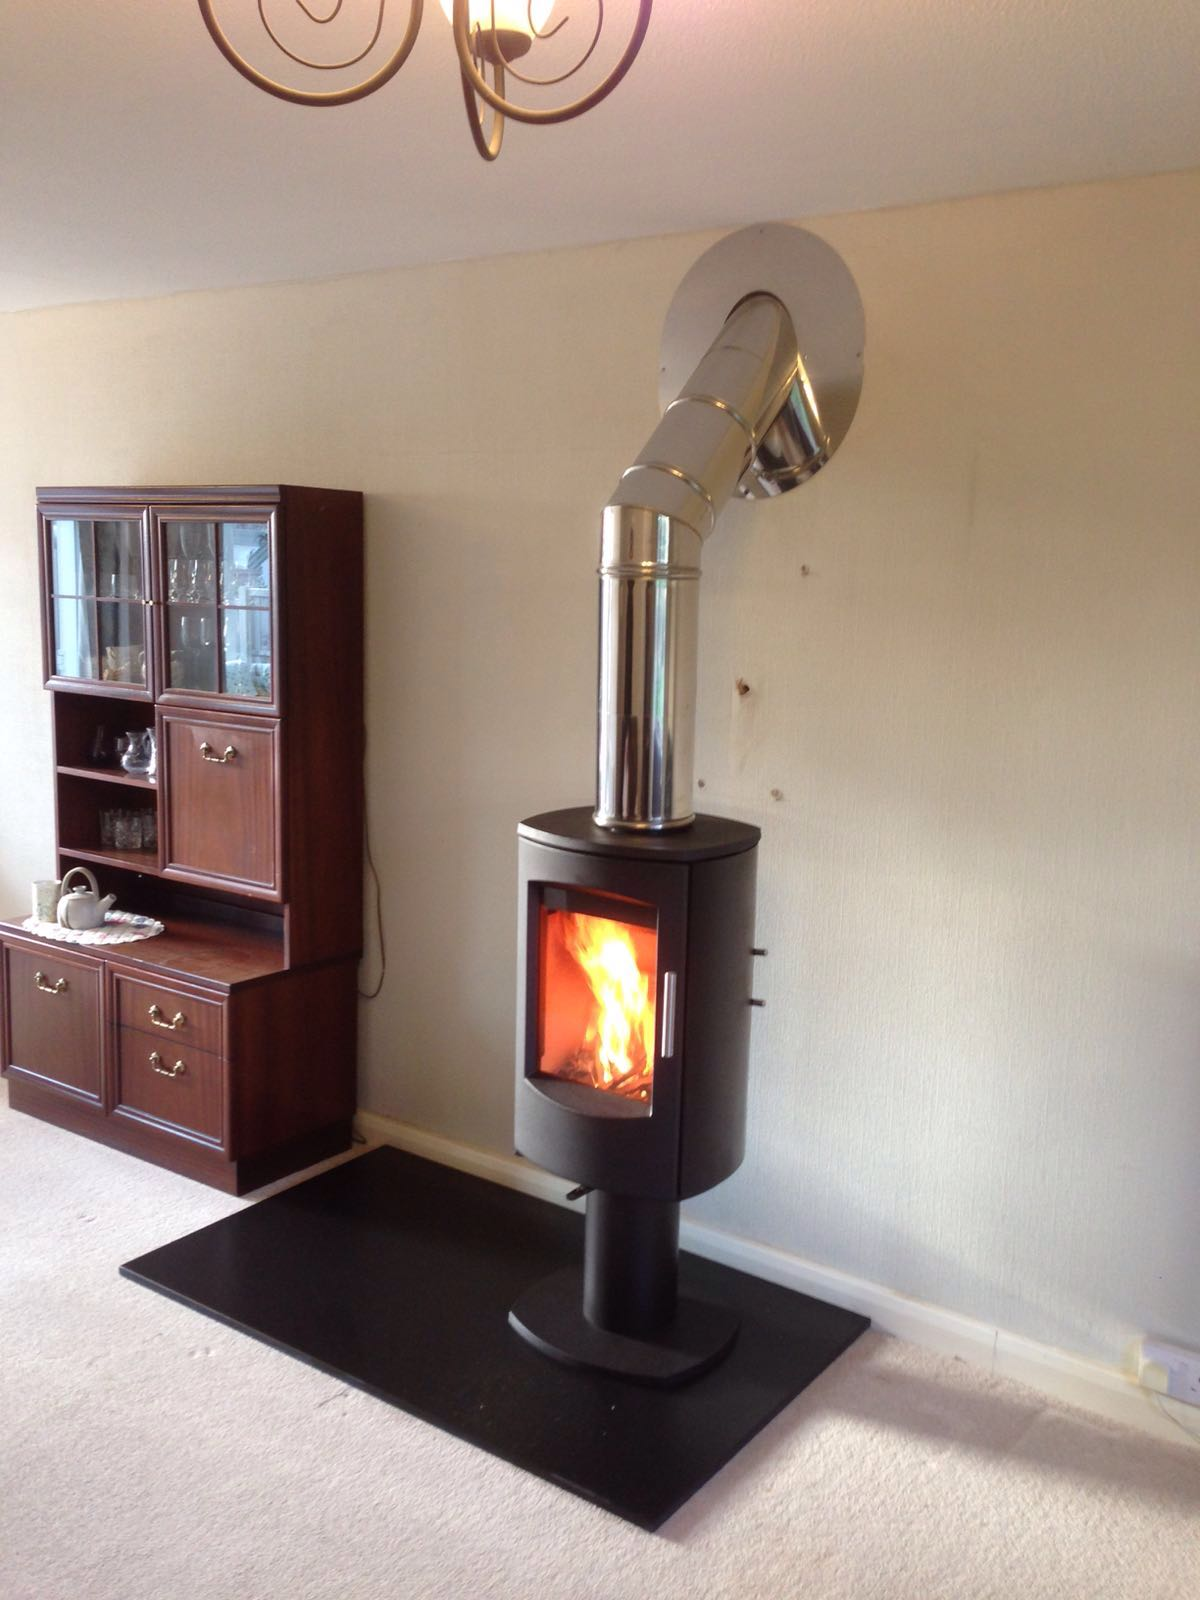 Embers Bristol stove istallation